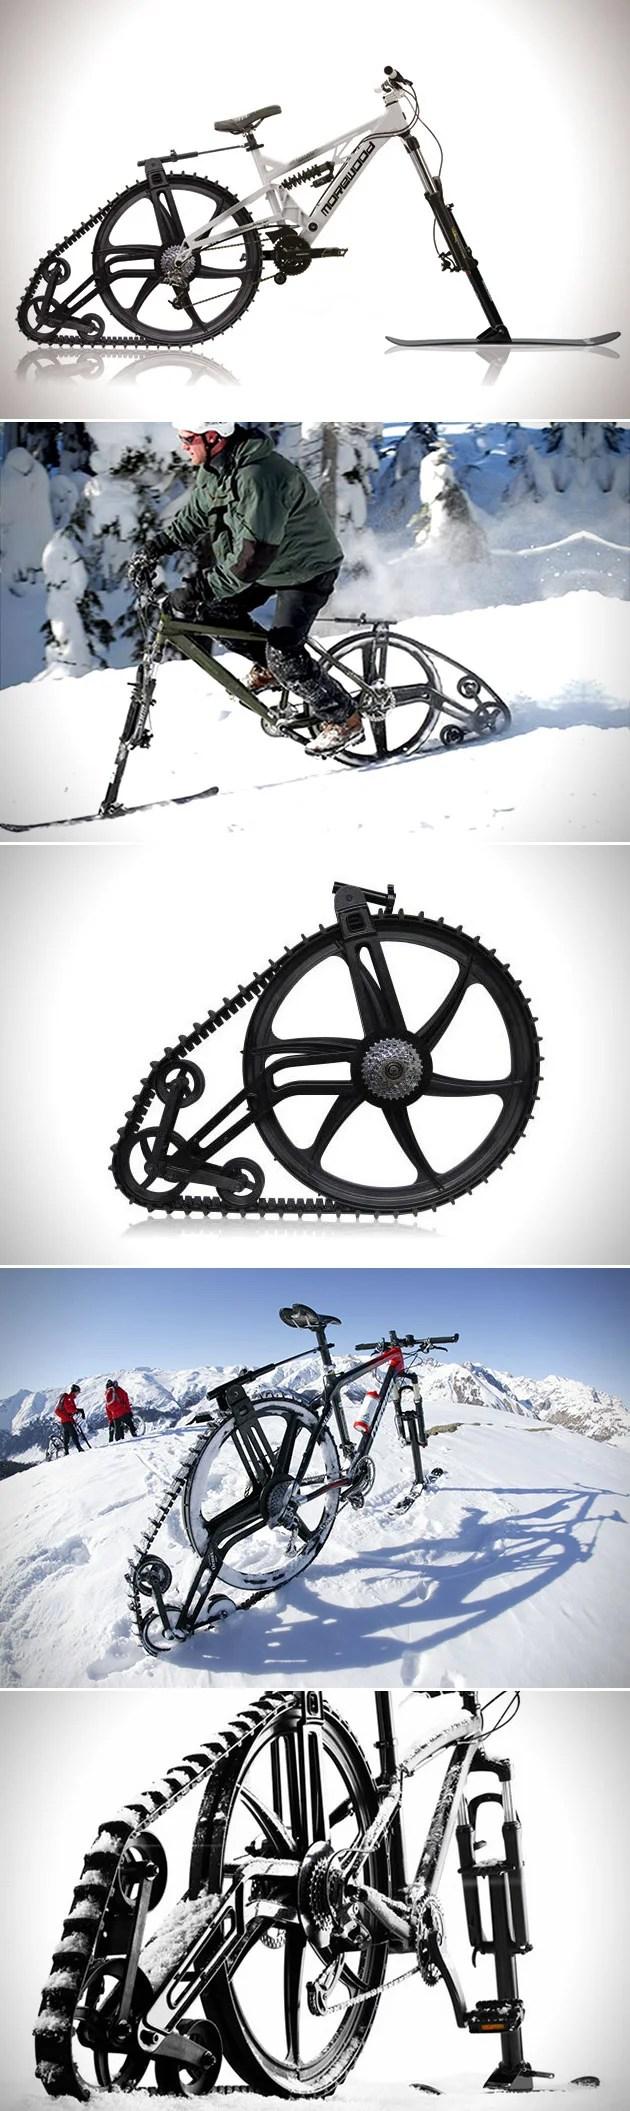 ktrak-snowmobile-kit